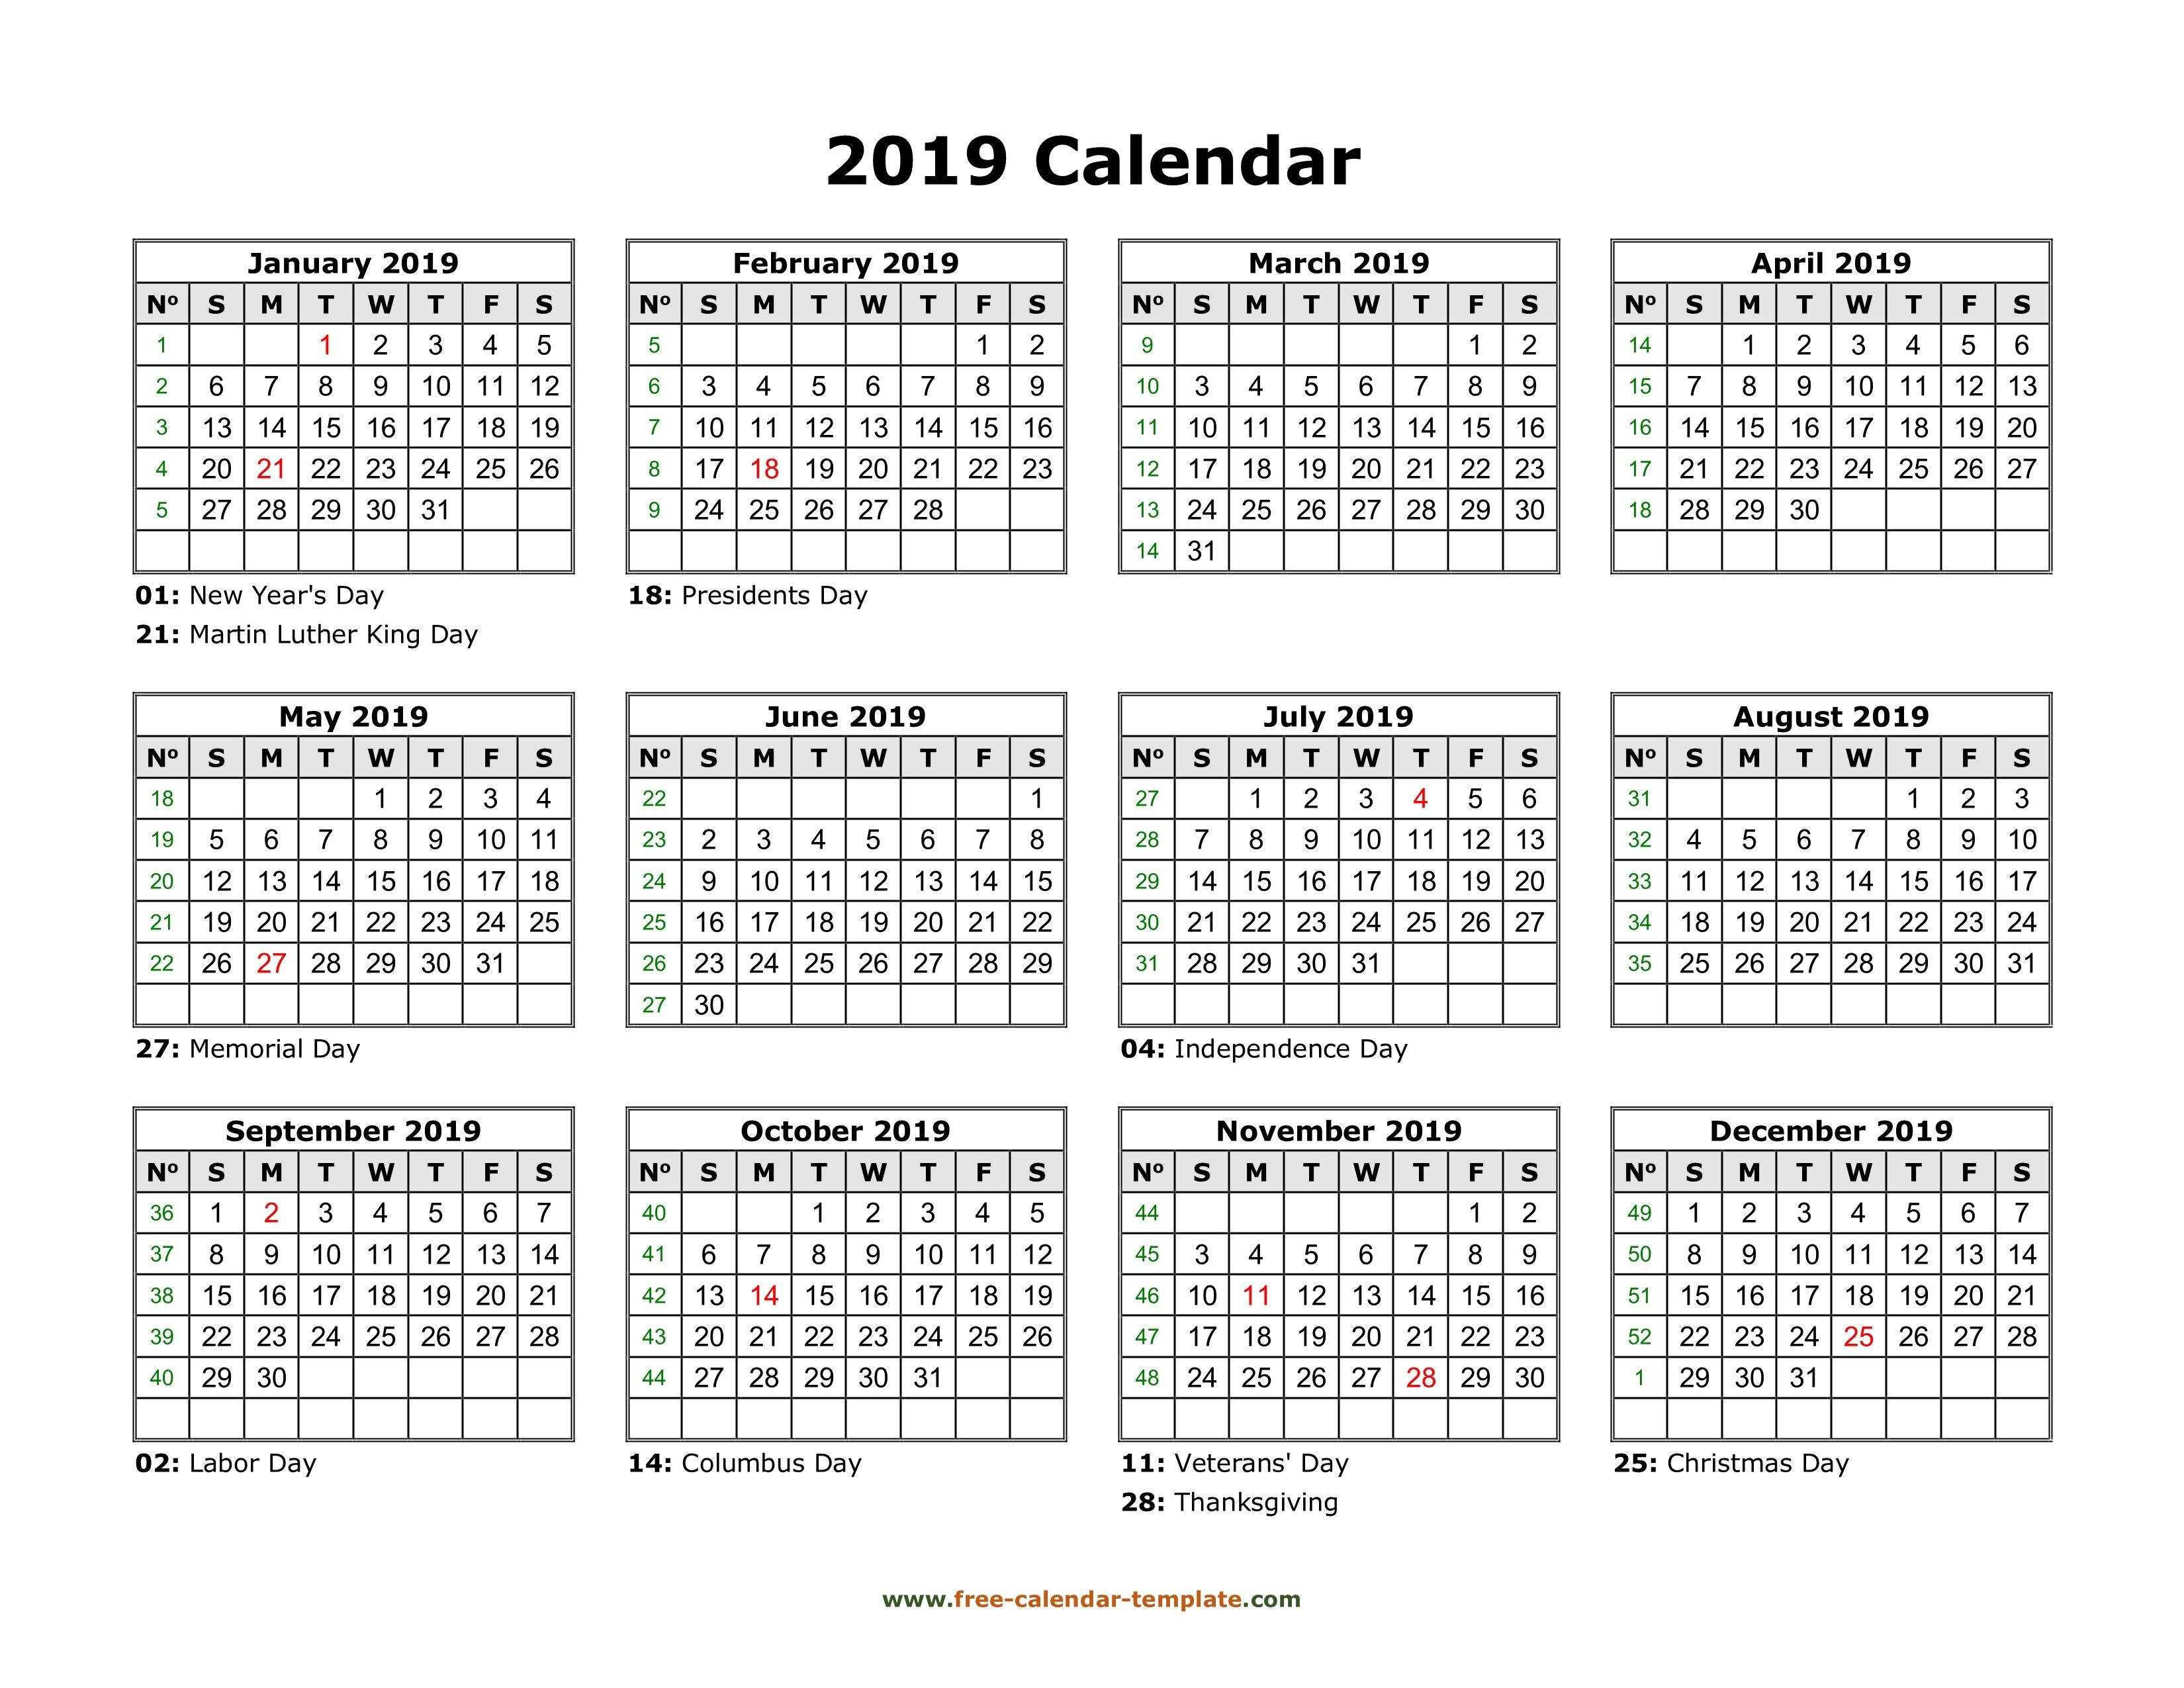 Yearly Calendar 2019 Printable With Federal Holidays | Free Calendar Calendar 2019 View